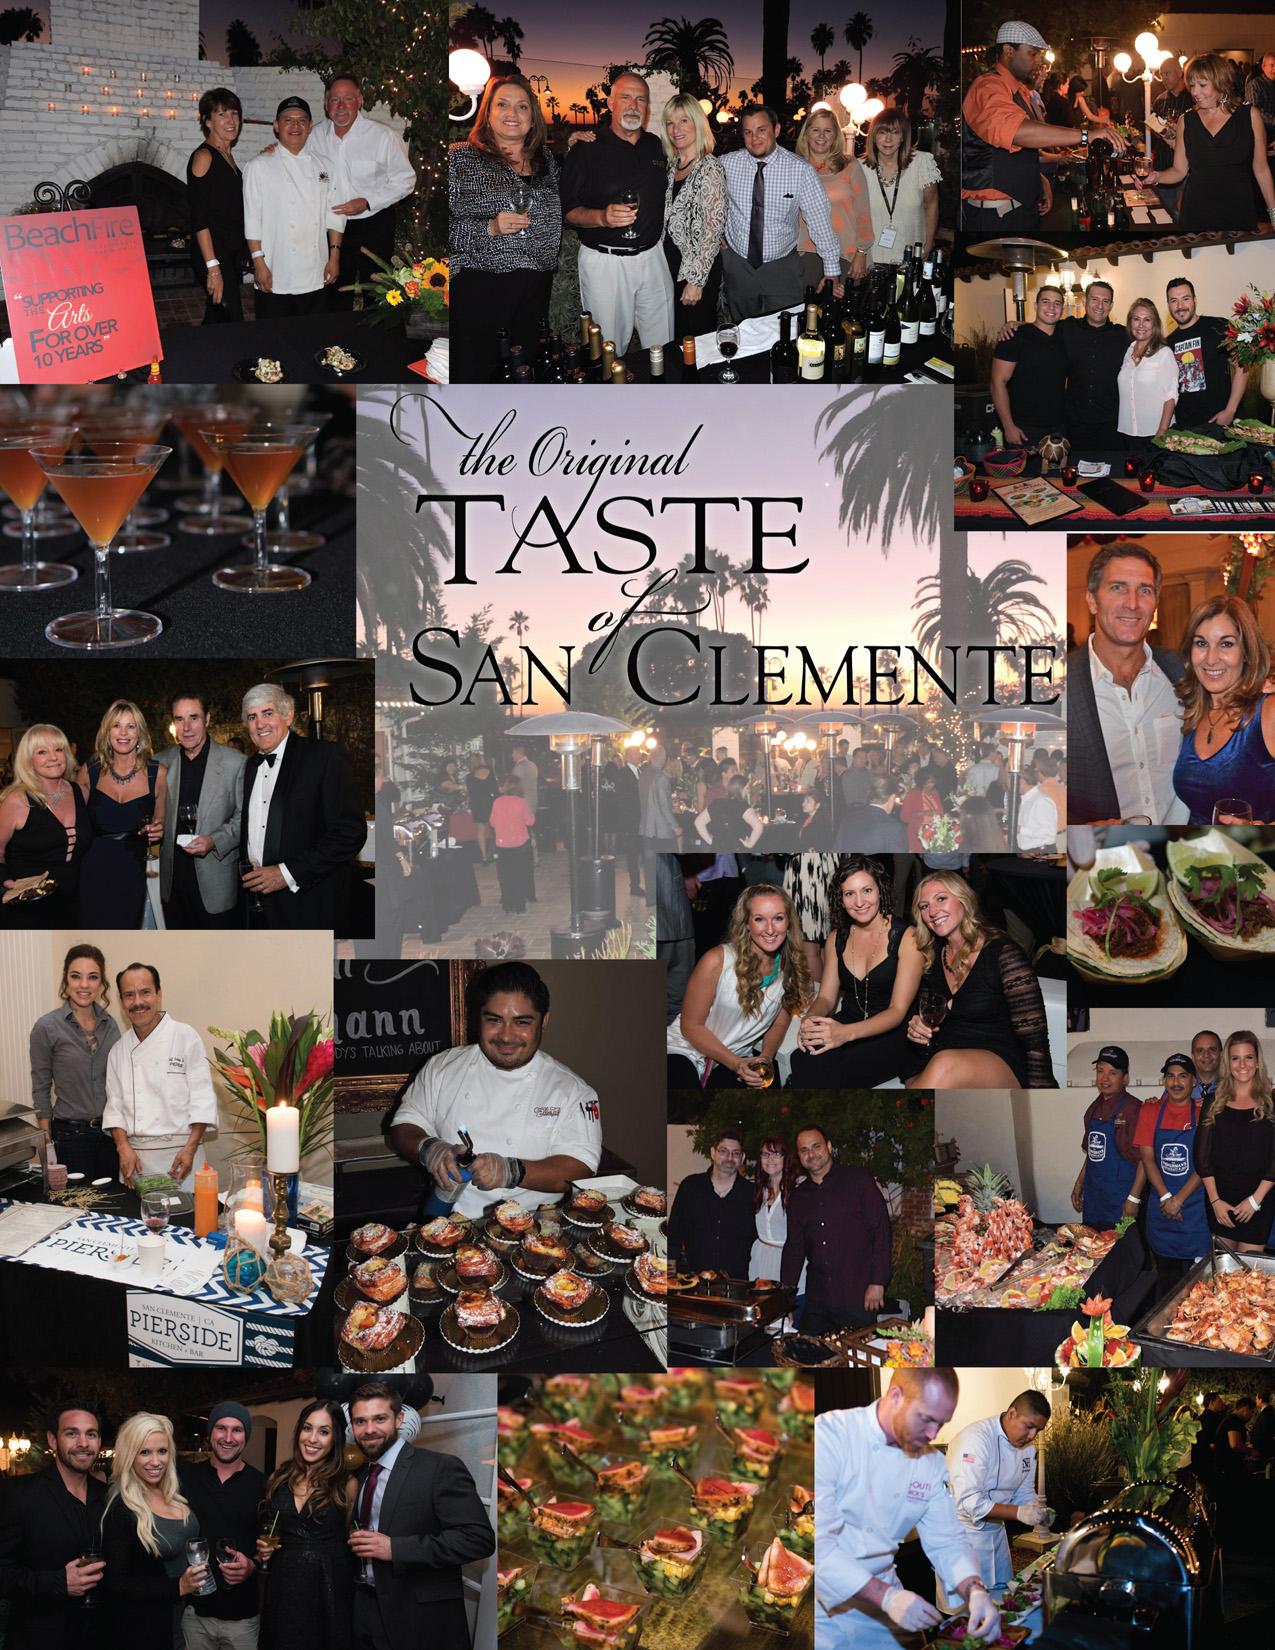 A Taste of San Clemente @ Casino San Clemente